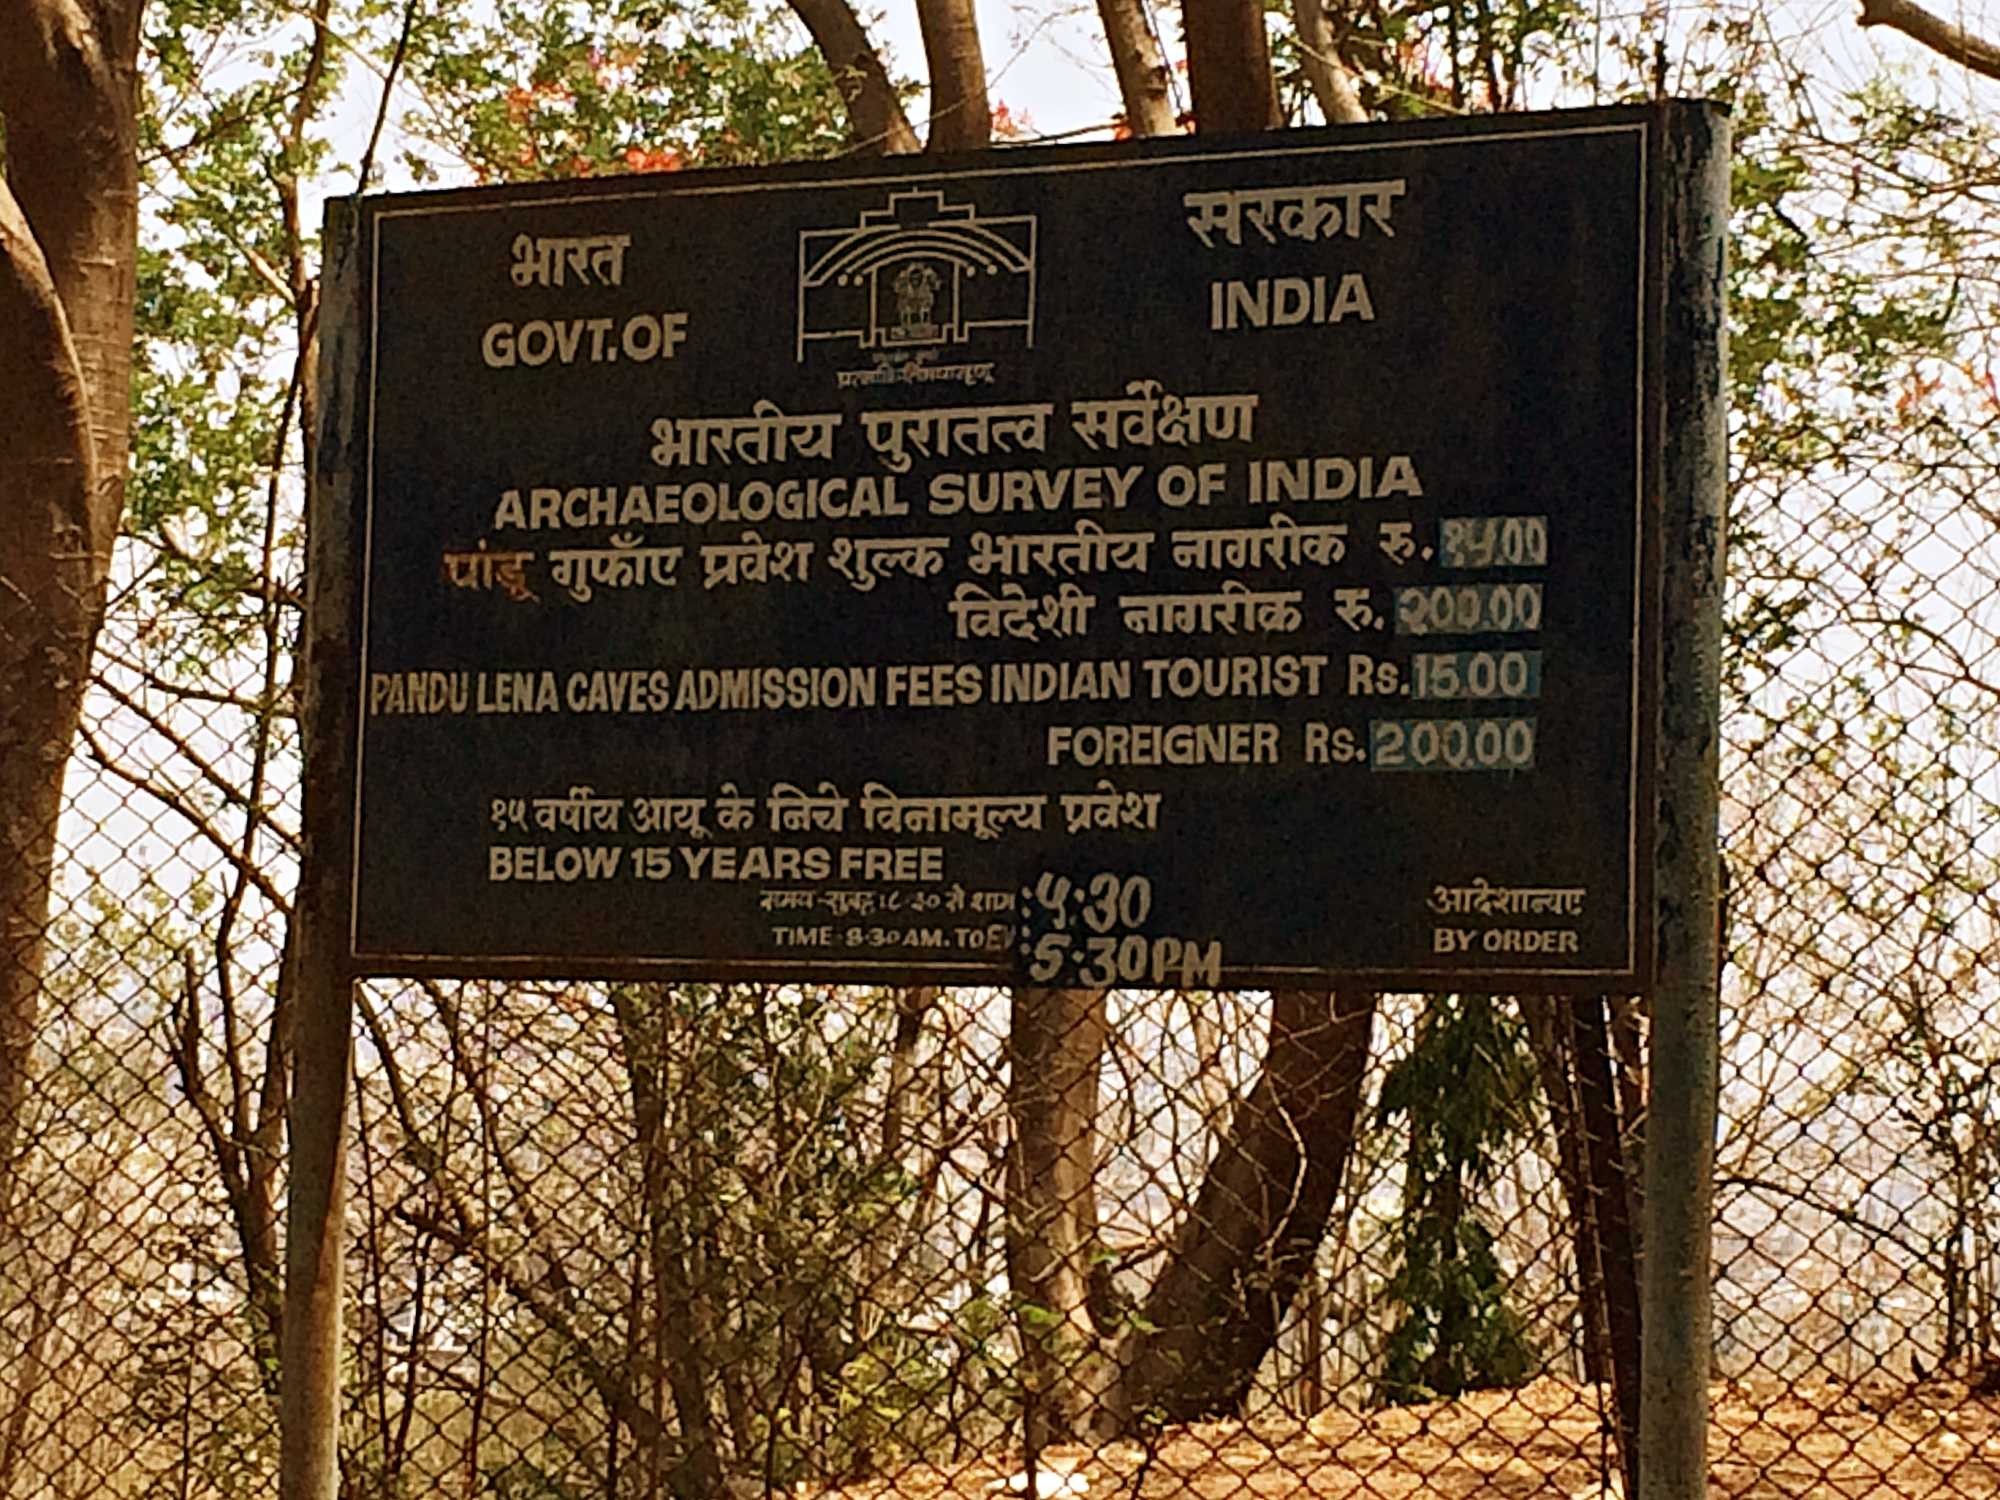 Pandulena Caves Maharashtra Tourism